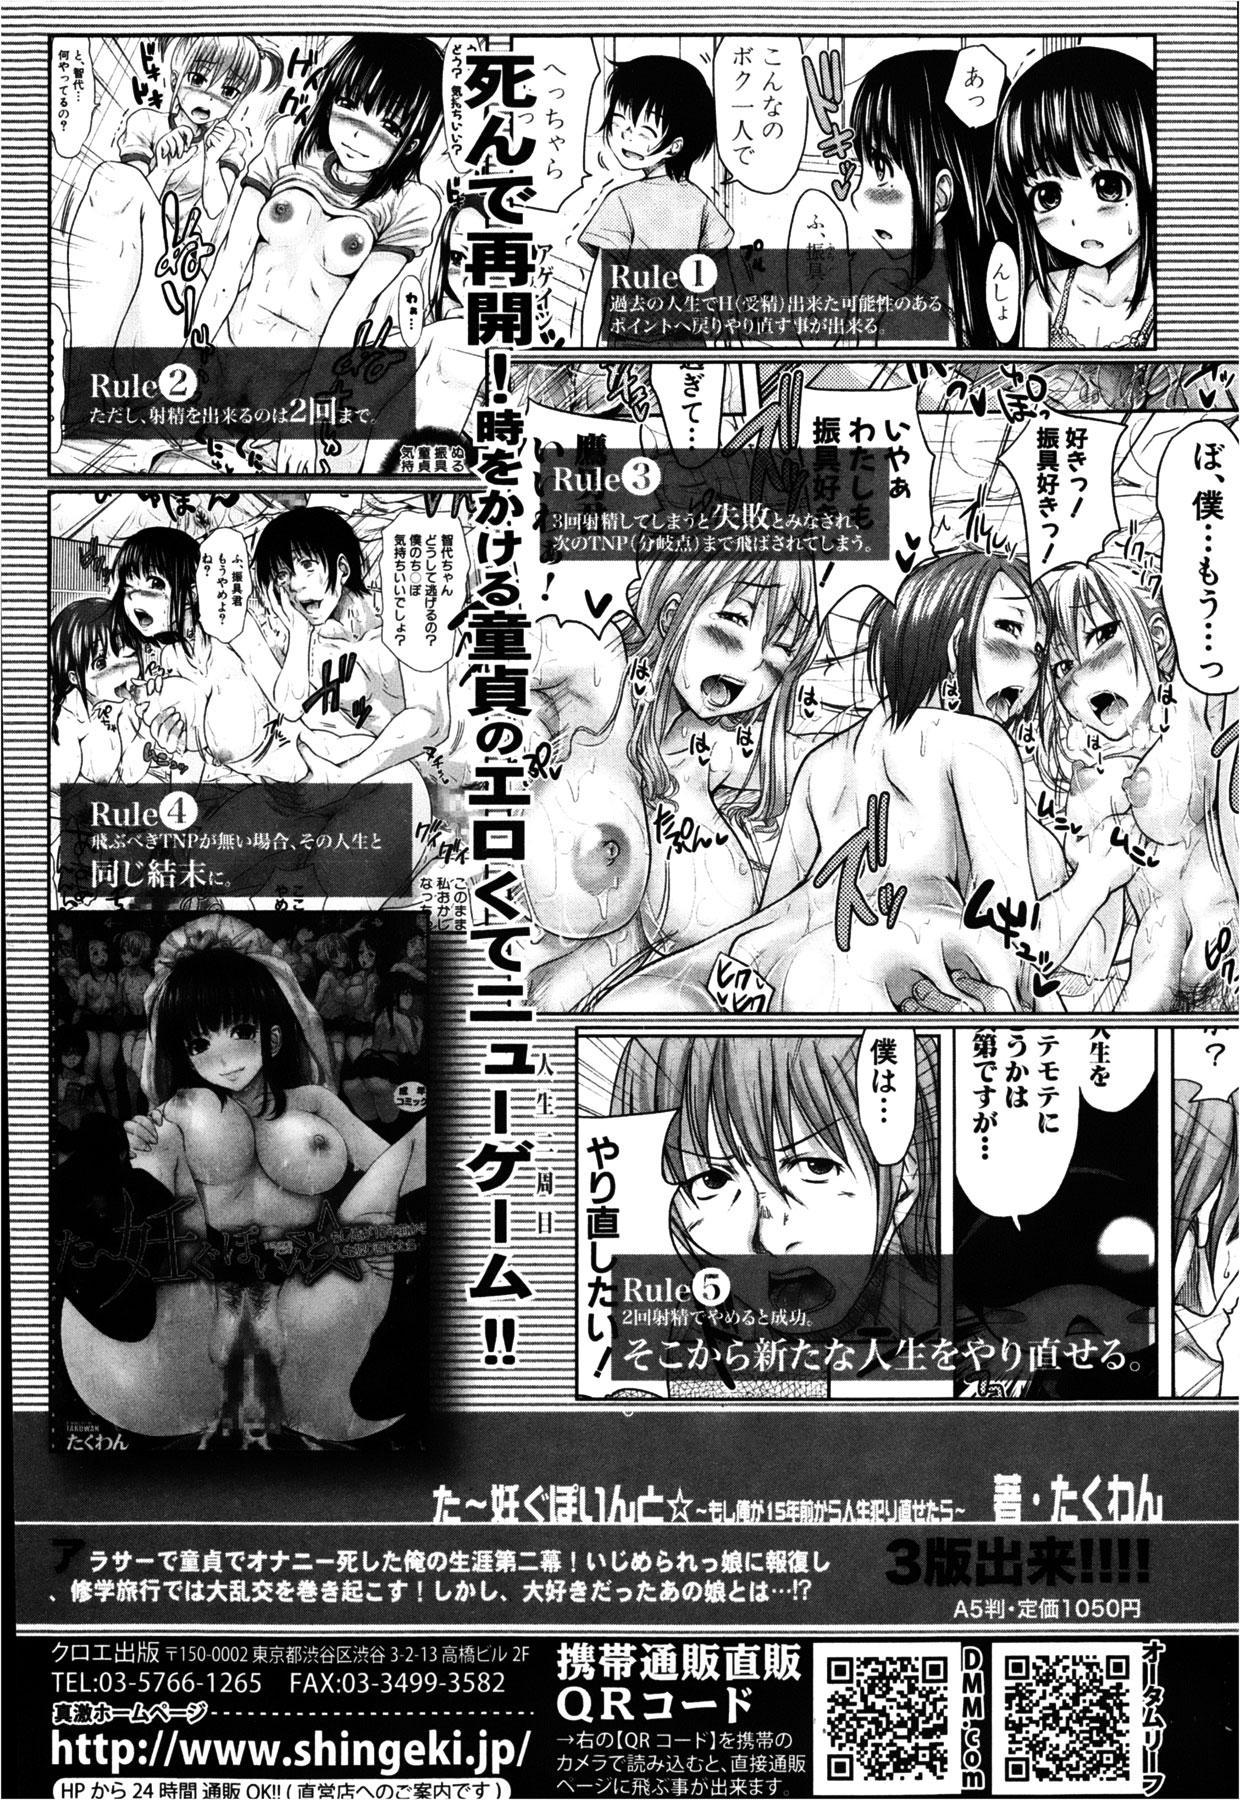 COMIC Shingeki 2013-02 89